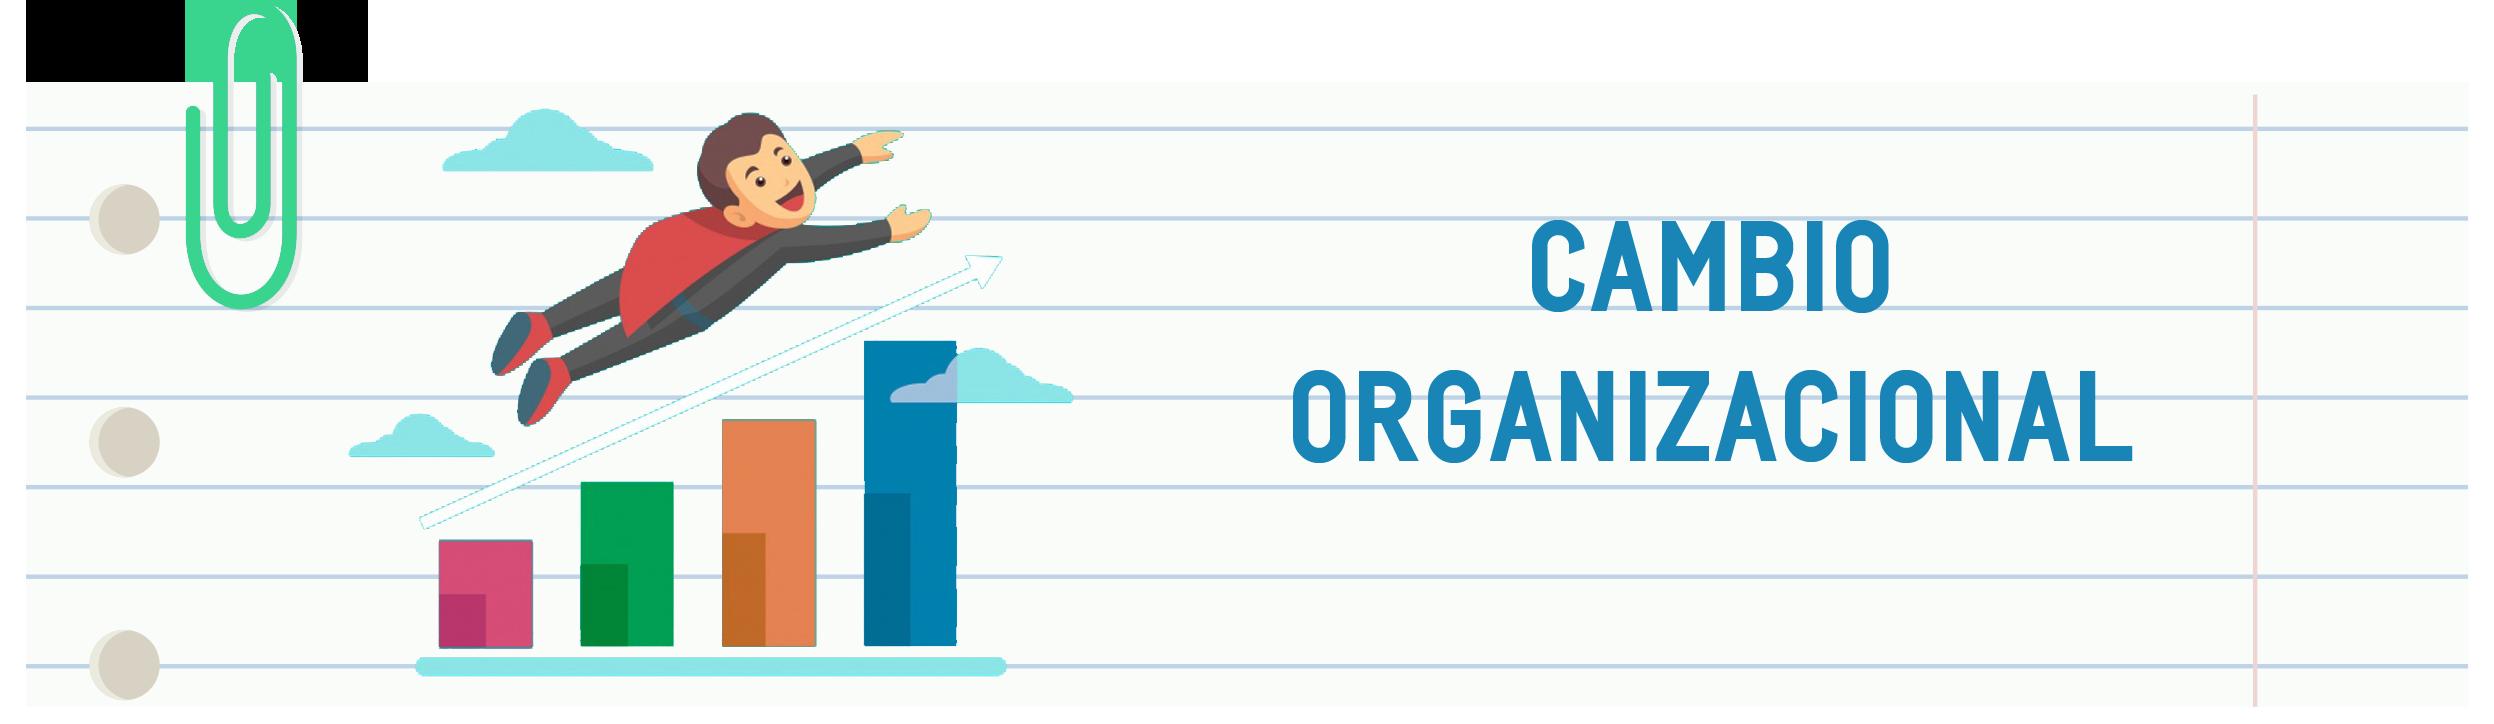 cambio_organizacional.png